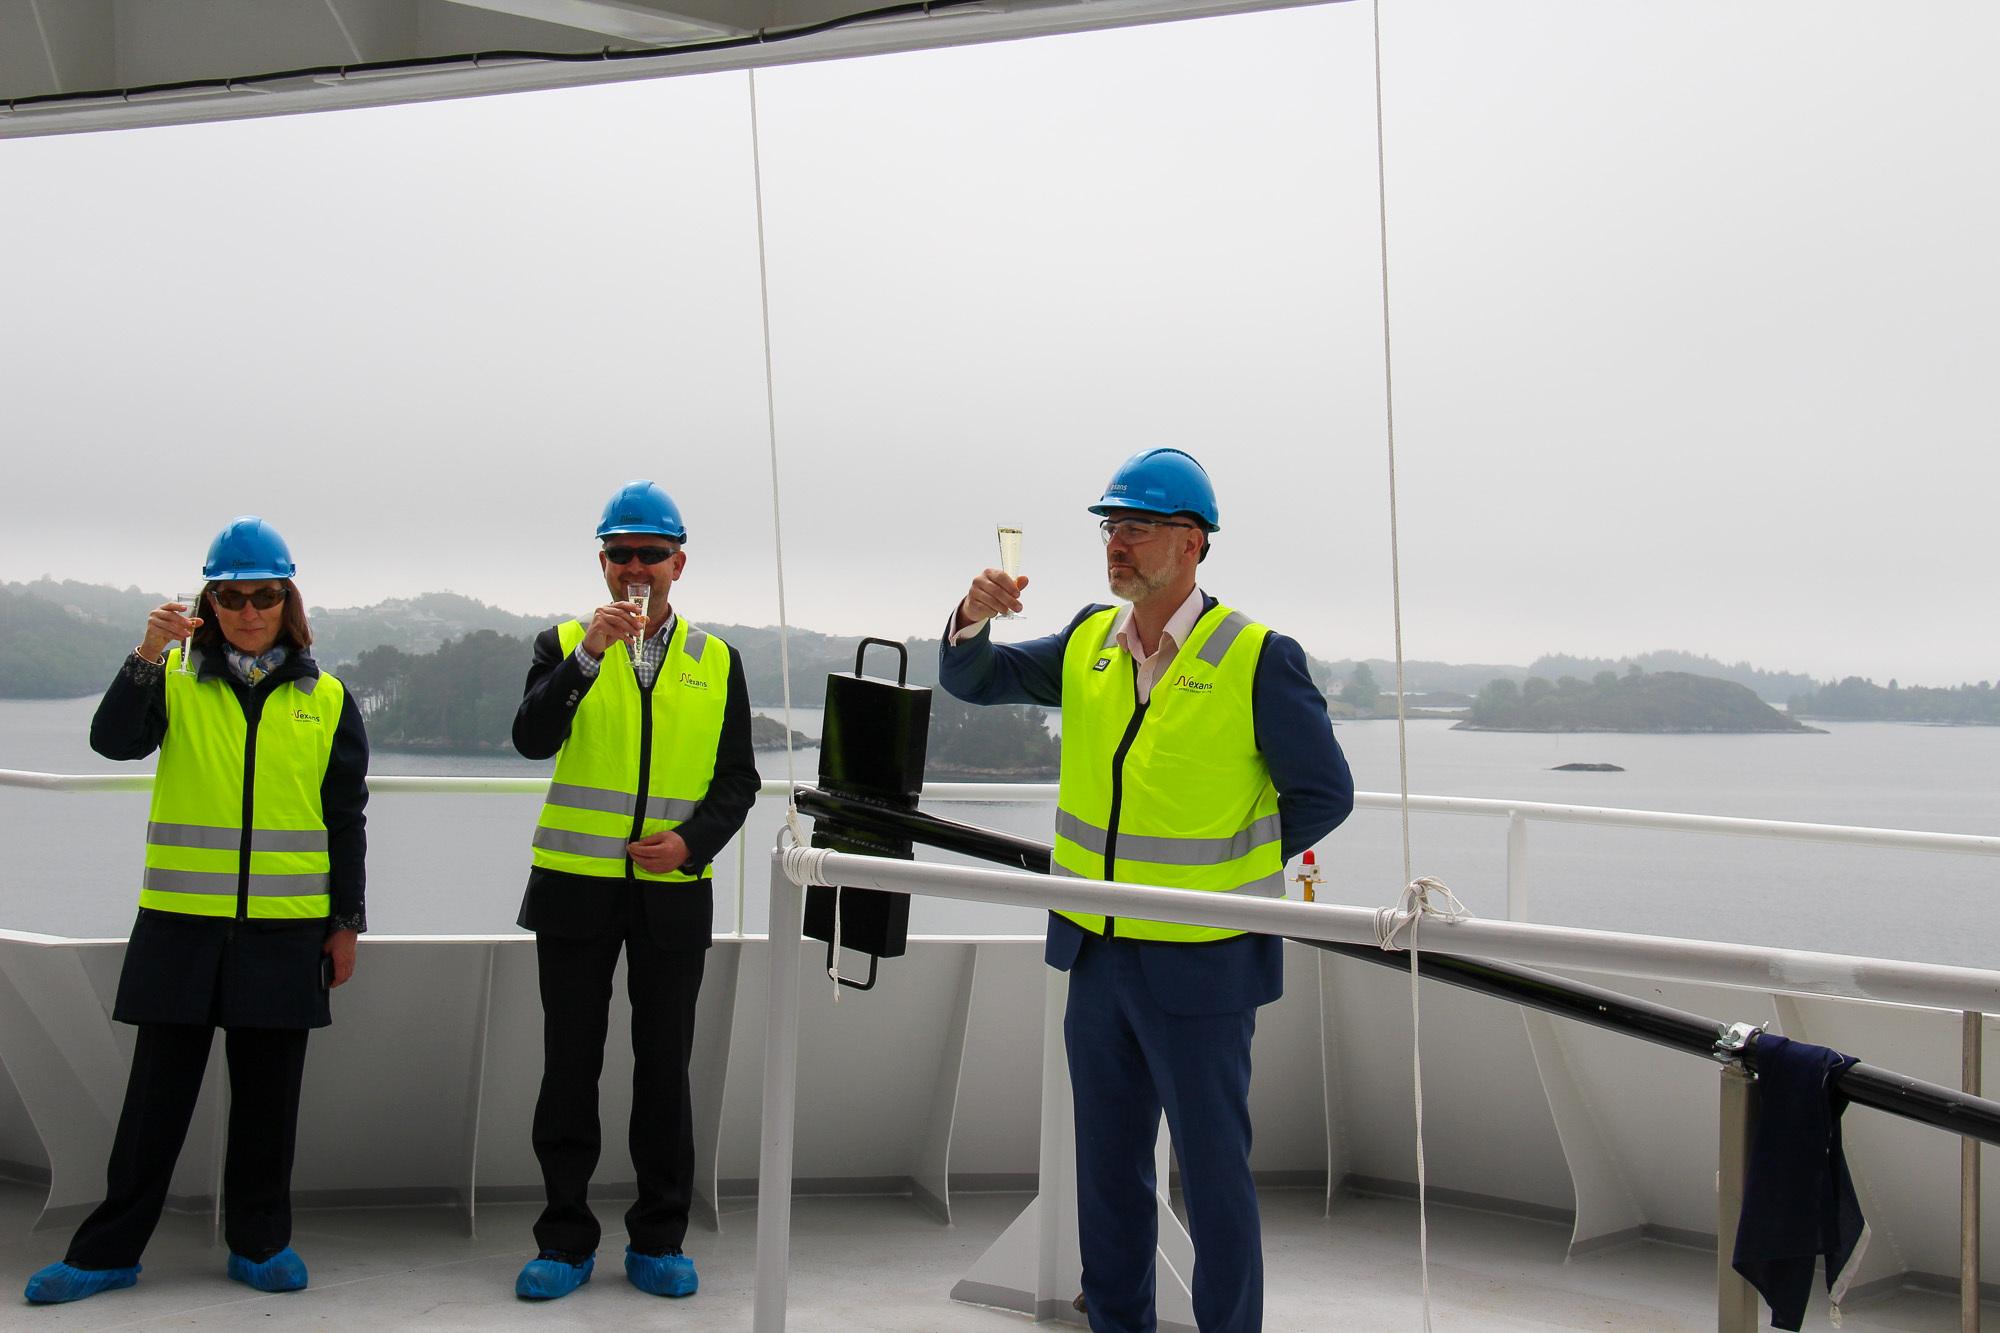 Nexans representatives, from left: Frederique Moreve (Controller & Finance Director) , Jon Ansten (Contract Manager) og Bjørn Ladegård ( VP Installation and Services).